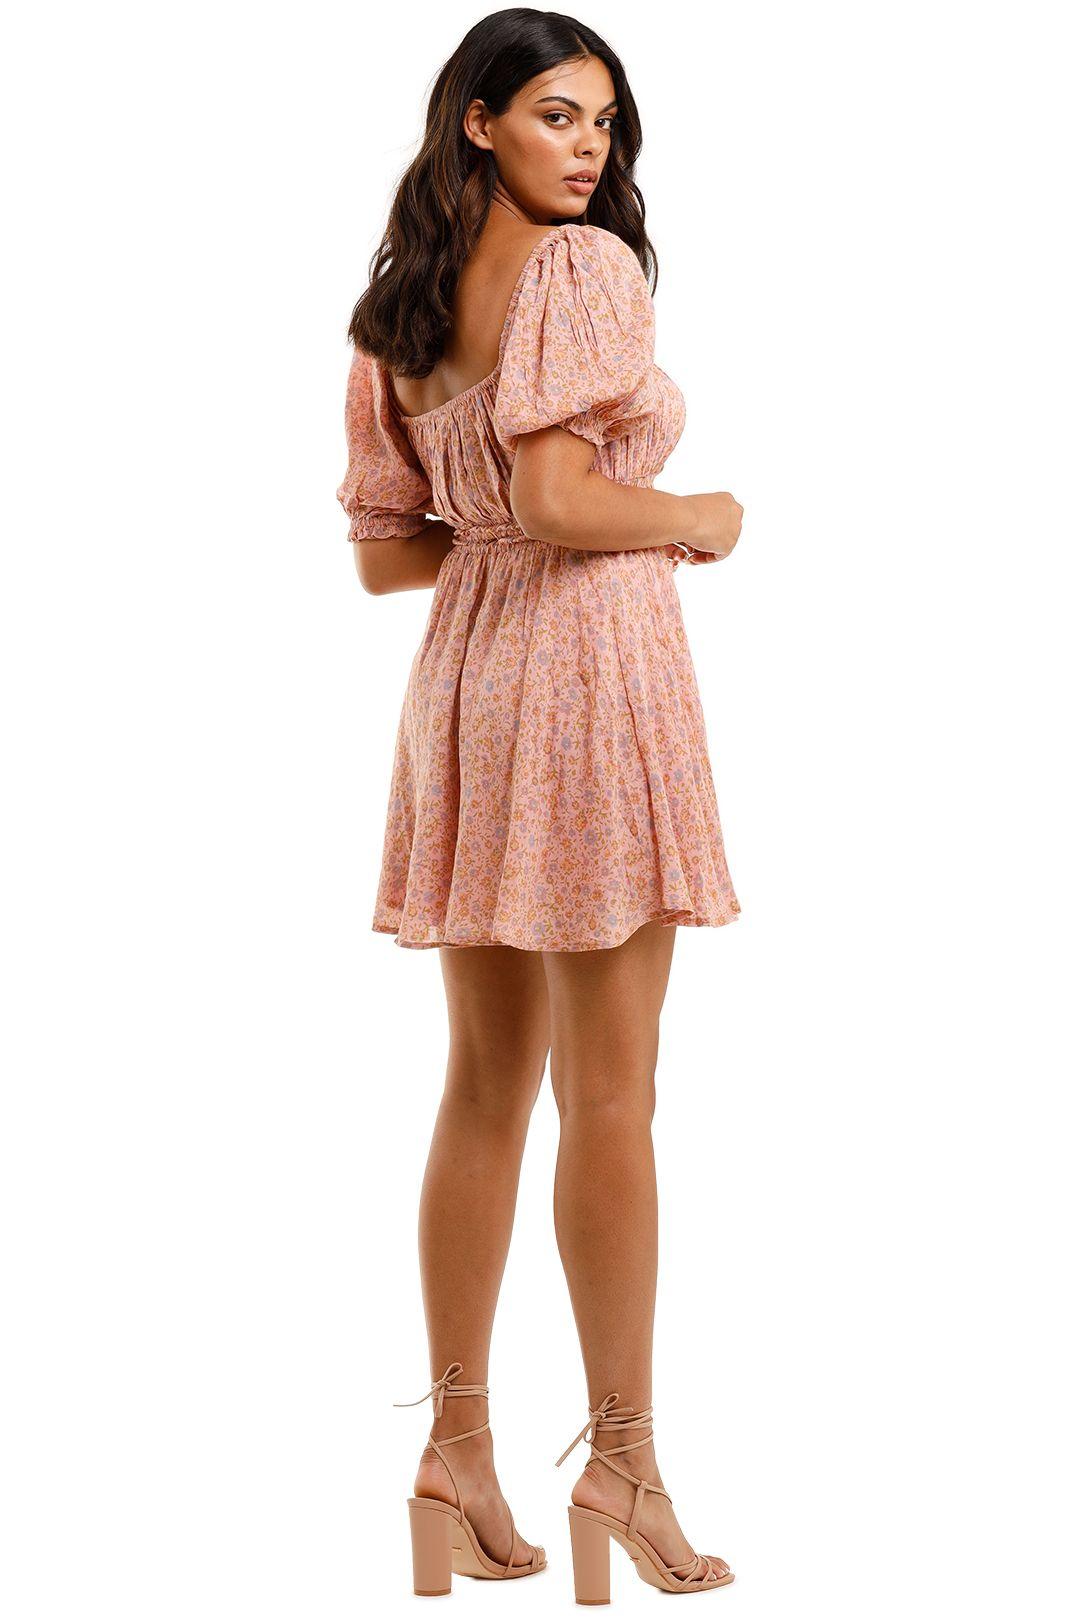 Spell Rae Mini Dress Dusty Pink Floral